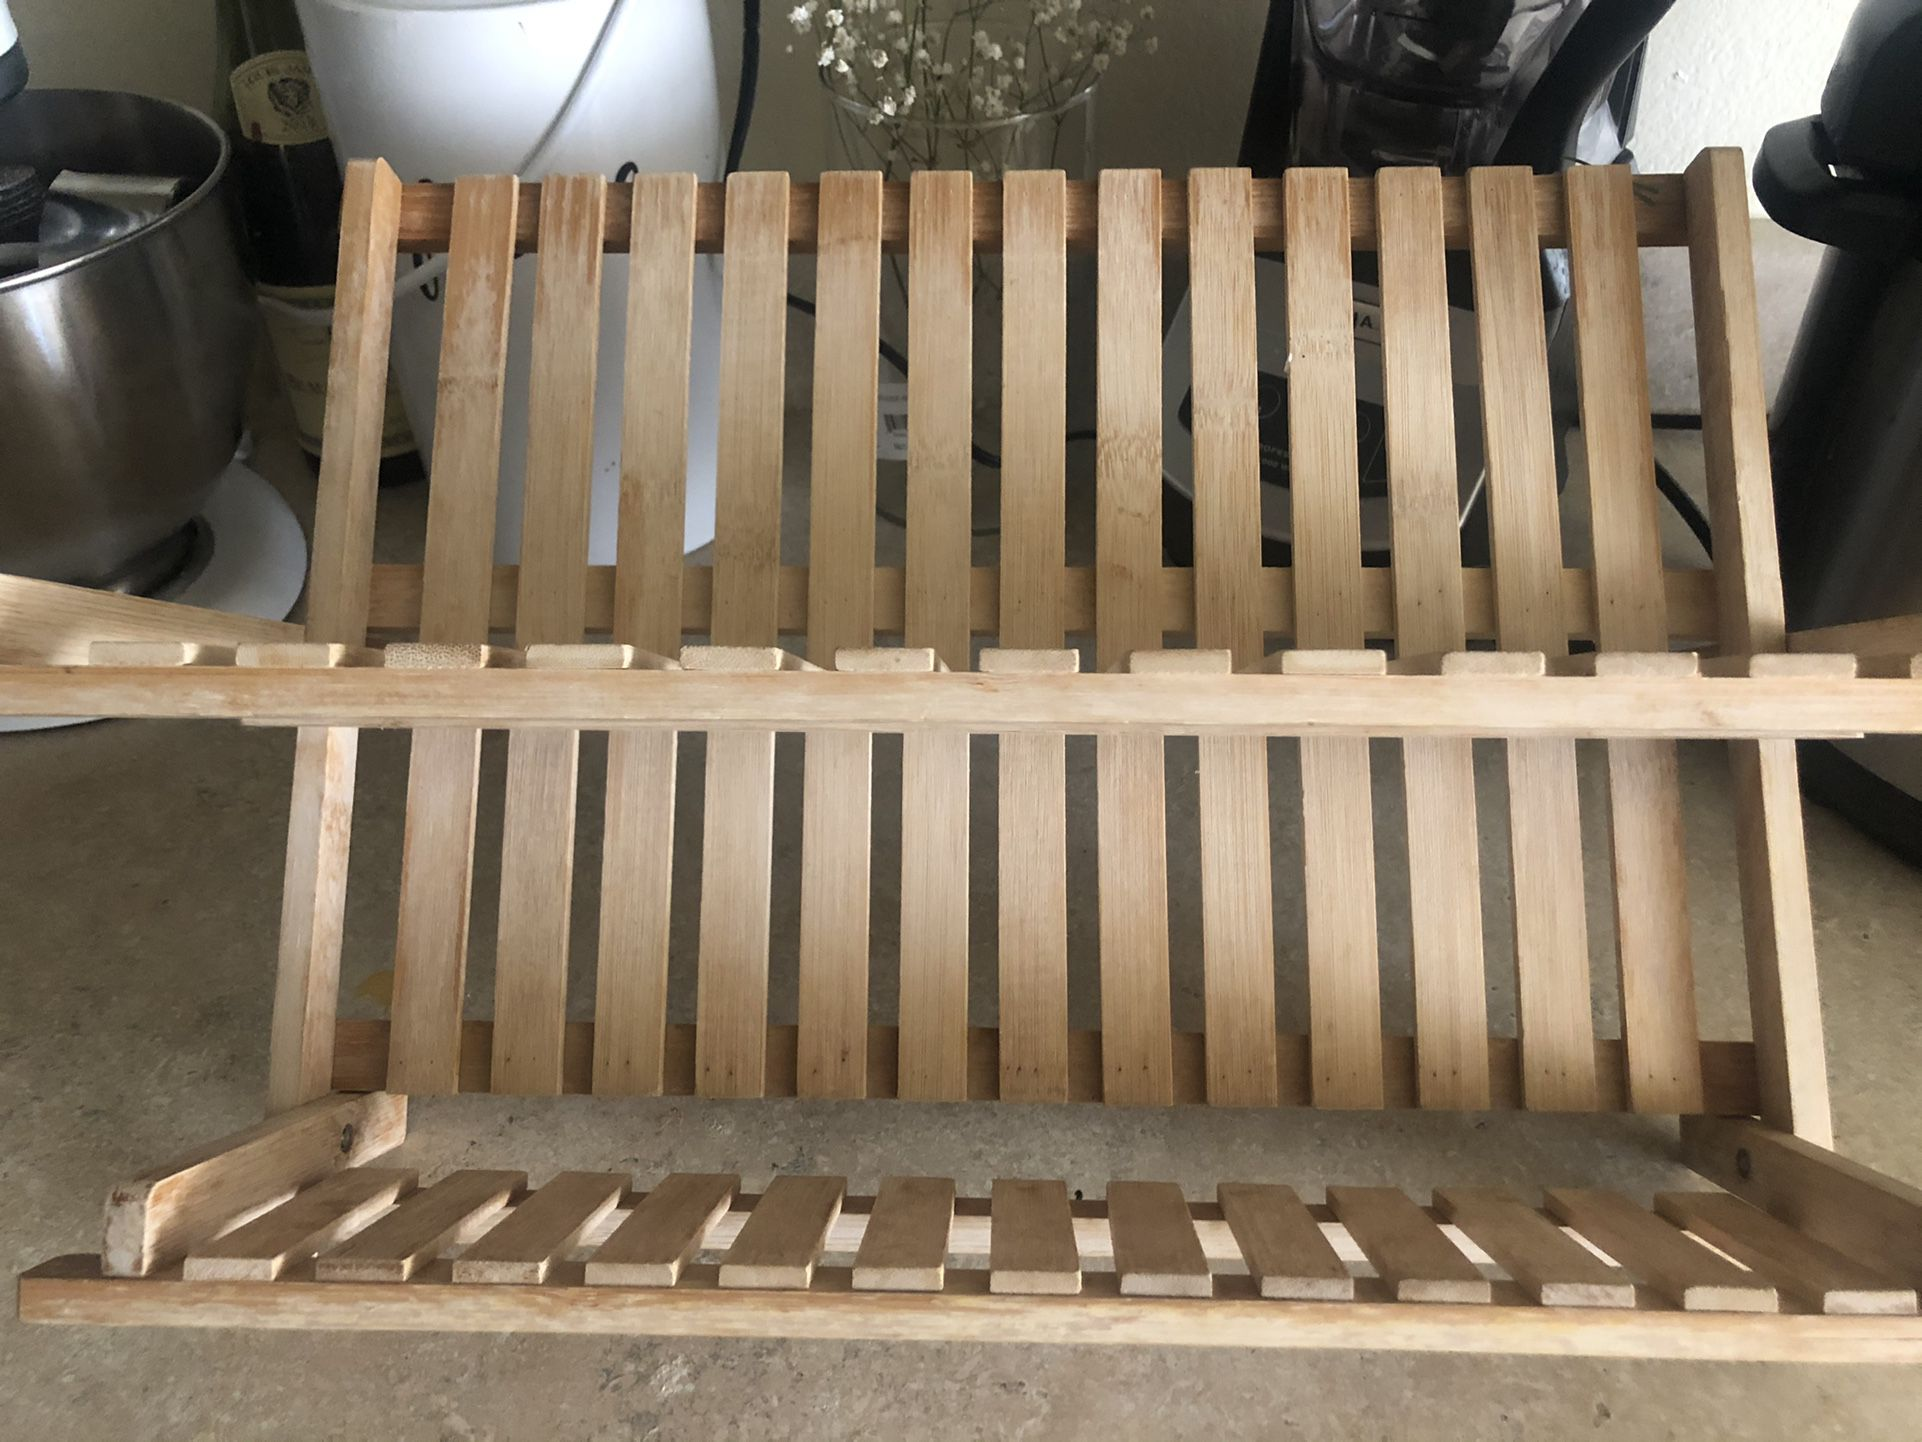 Wooden Dish Drying Rack